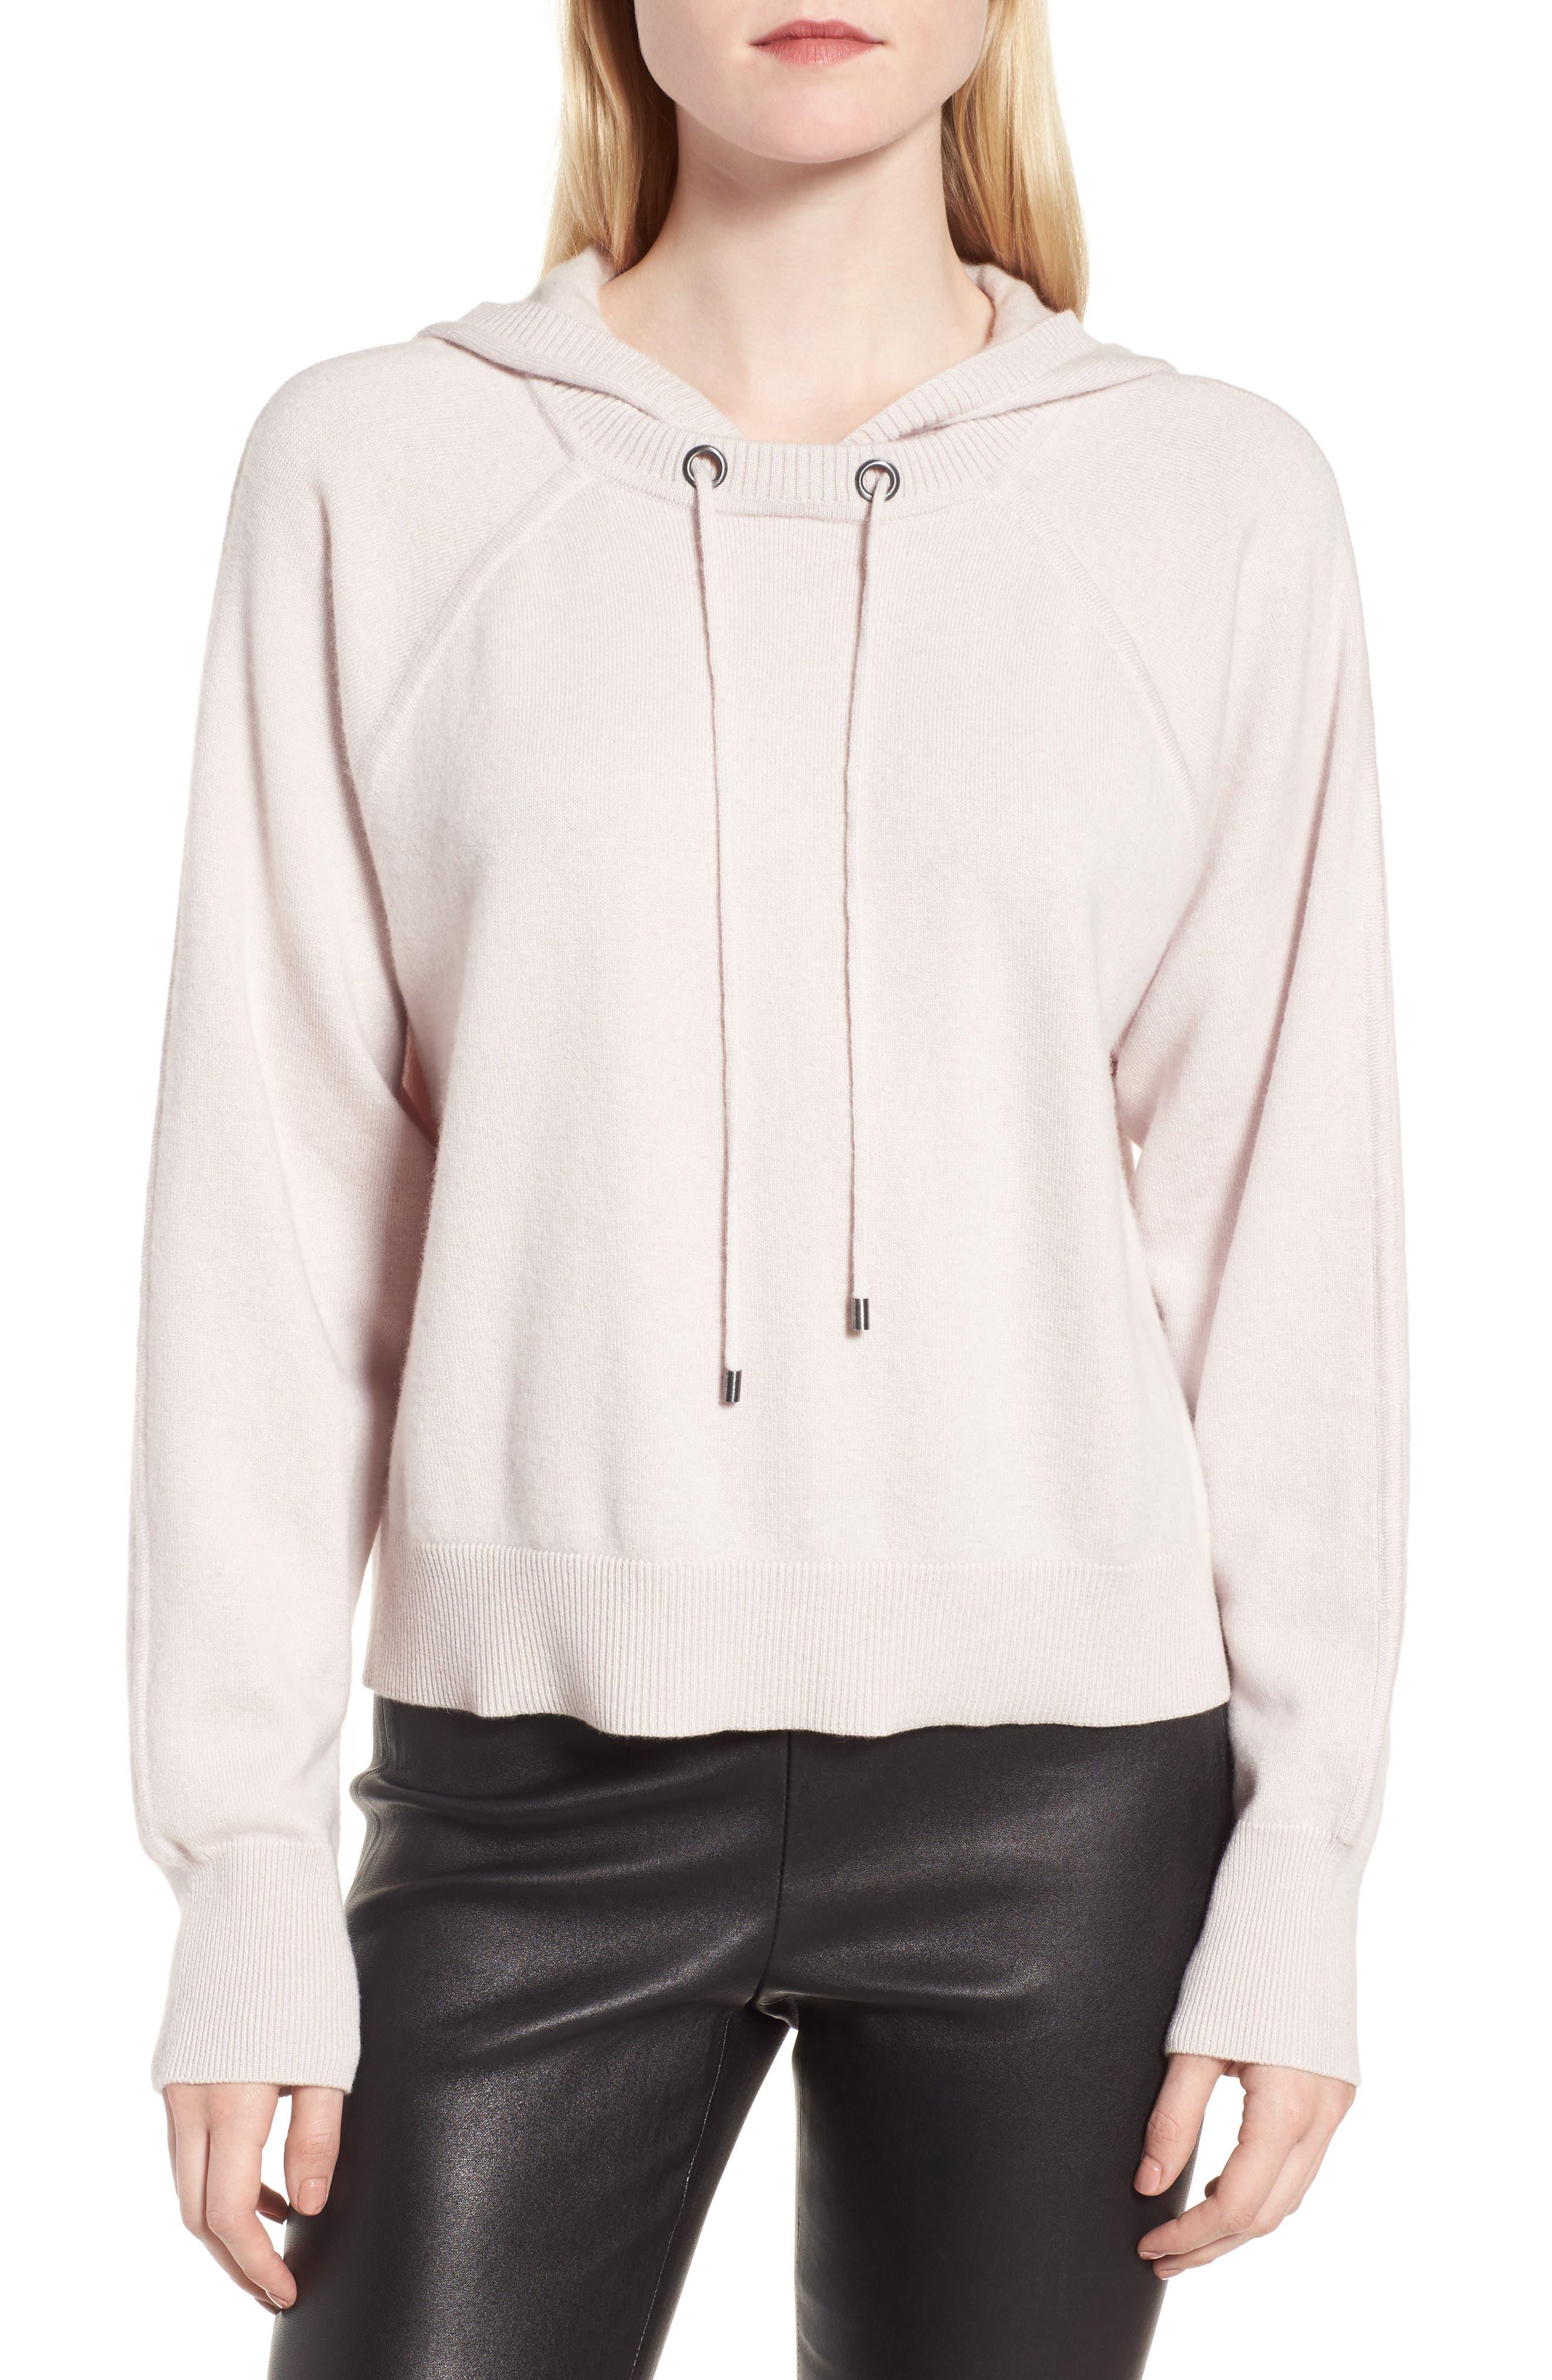 Nordstrom Signature Cashmere-Blend Hoodie Sweatshirt